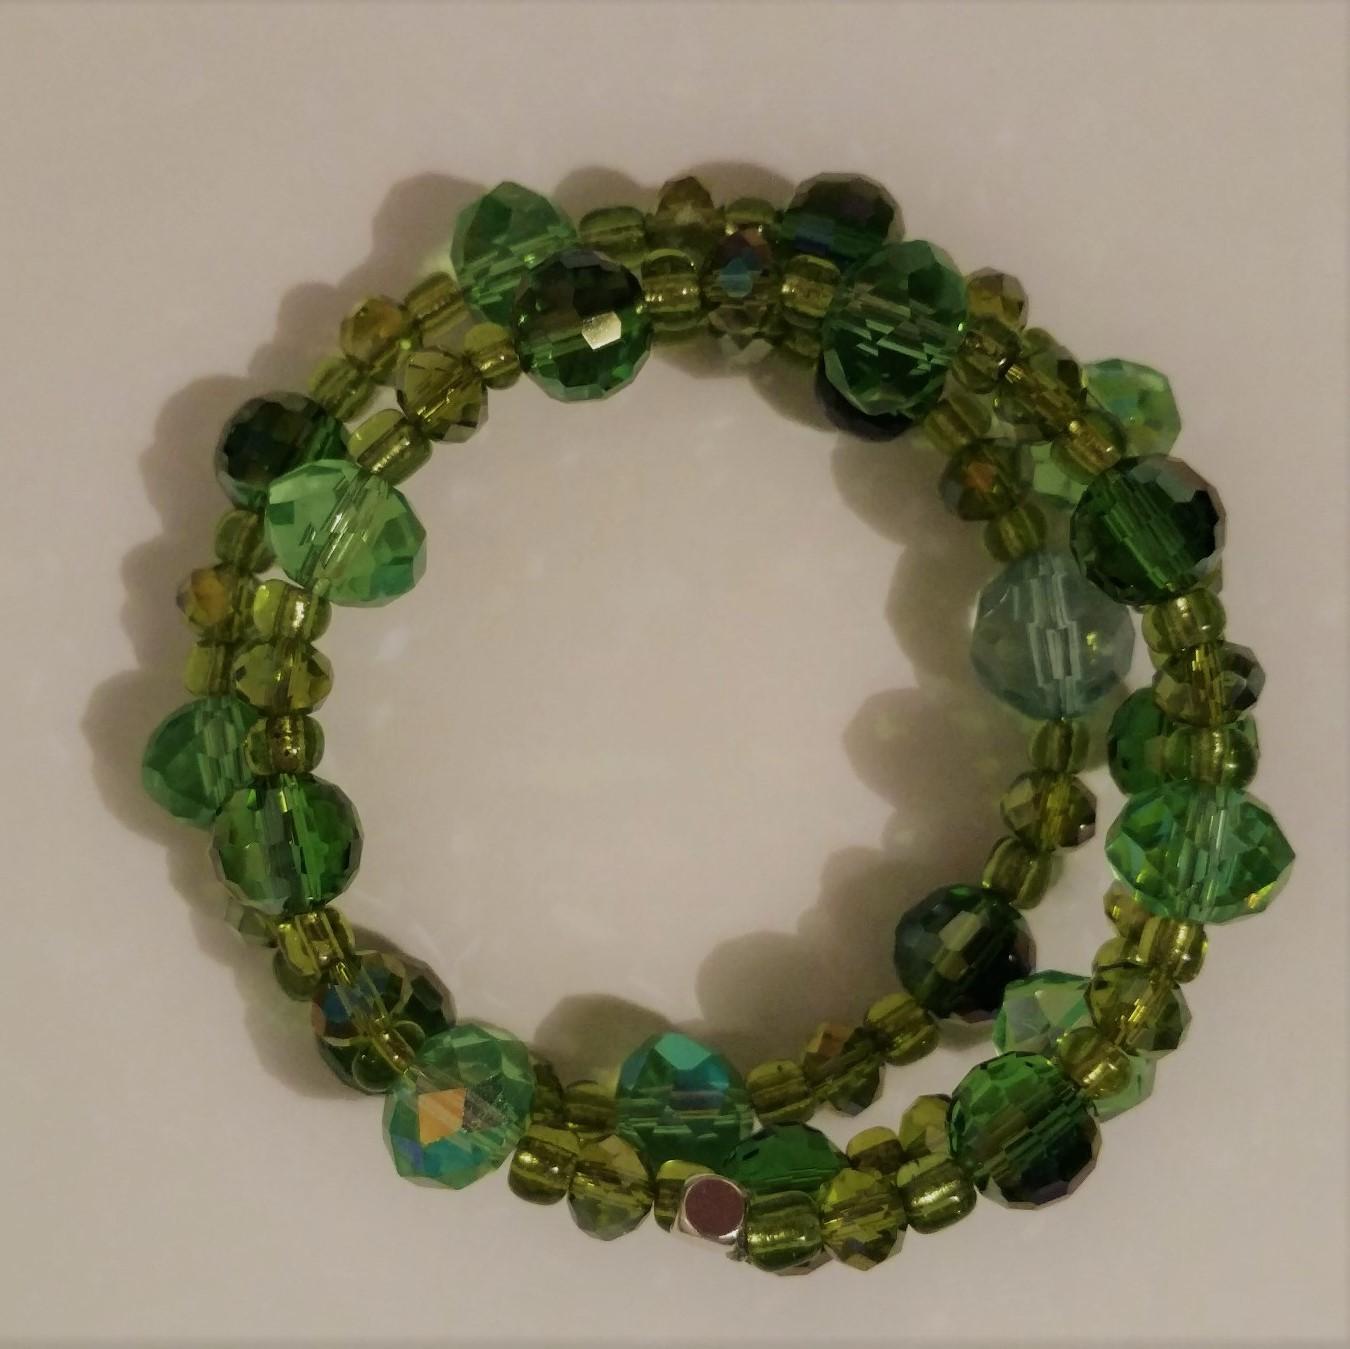 #JW-B 190001 Bracelet  Suggested $20 USD